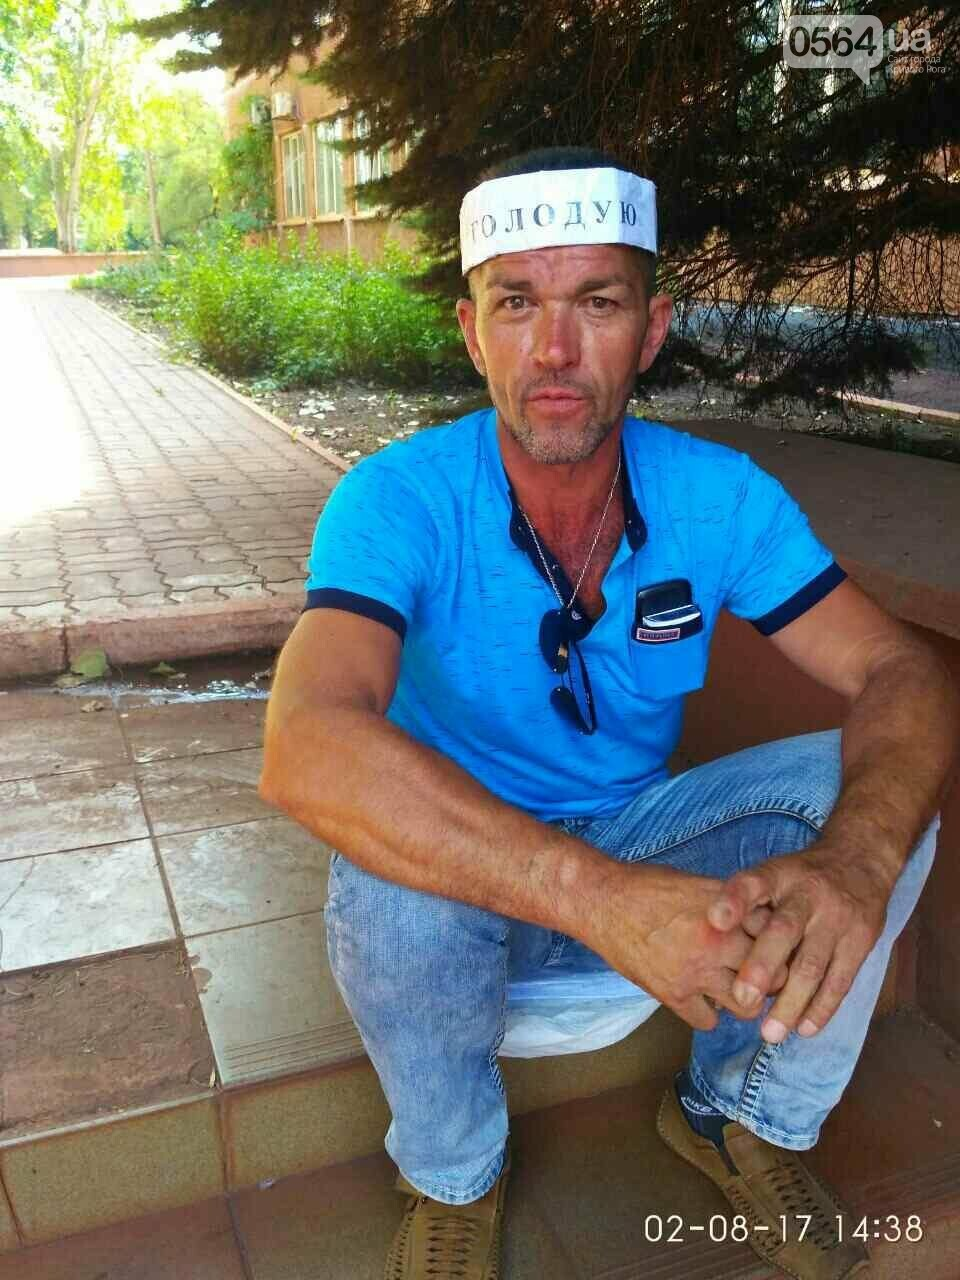 В Кривом Роге шахтер объявил голодовку, требуя зарплаты в 1000 евро и достойных условий труда (ФОТО), фото-1